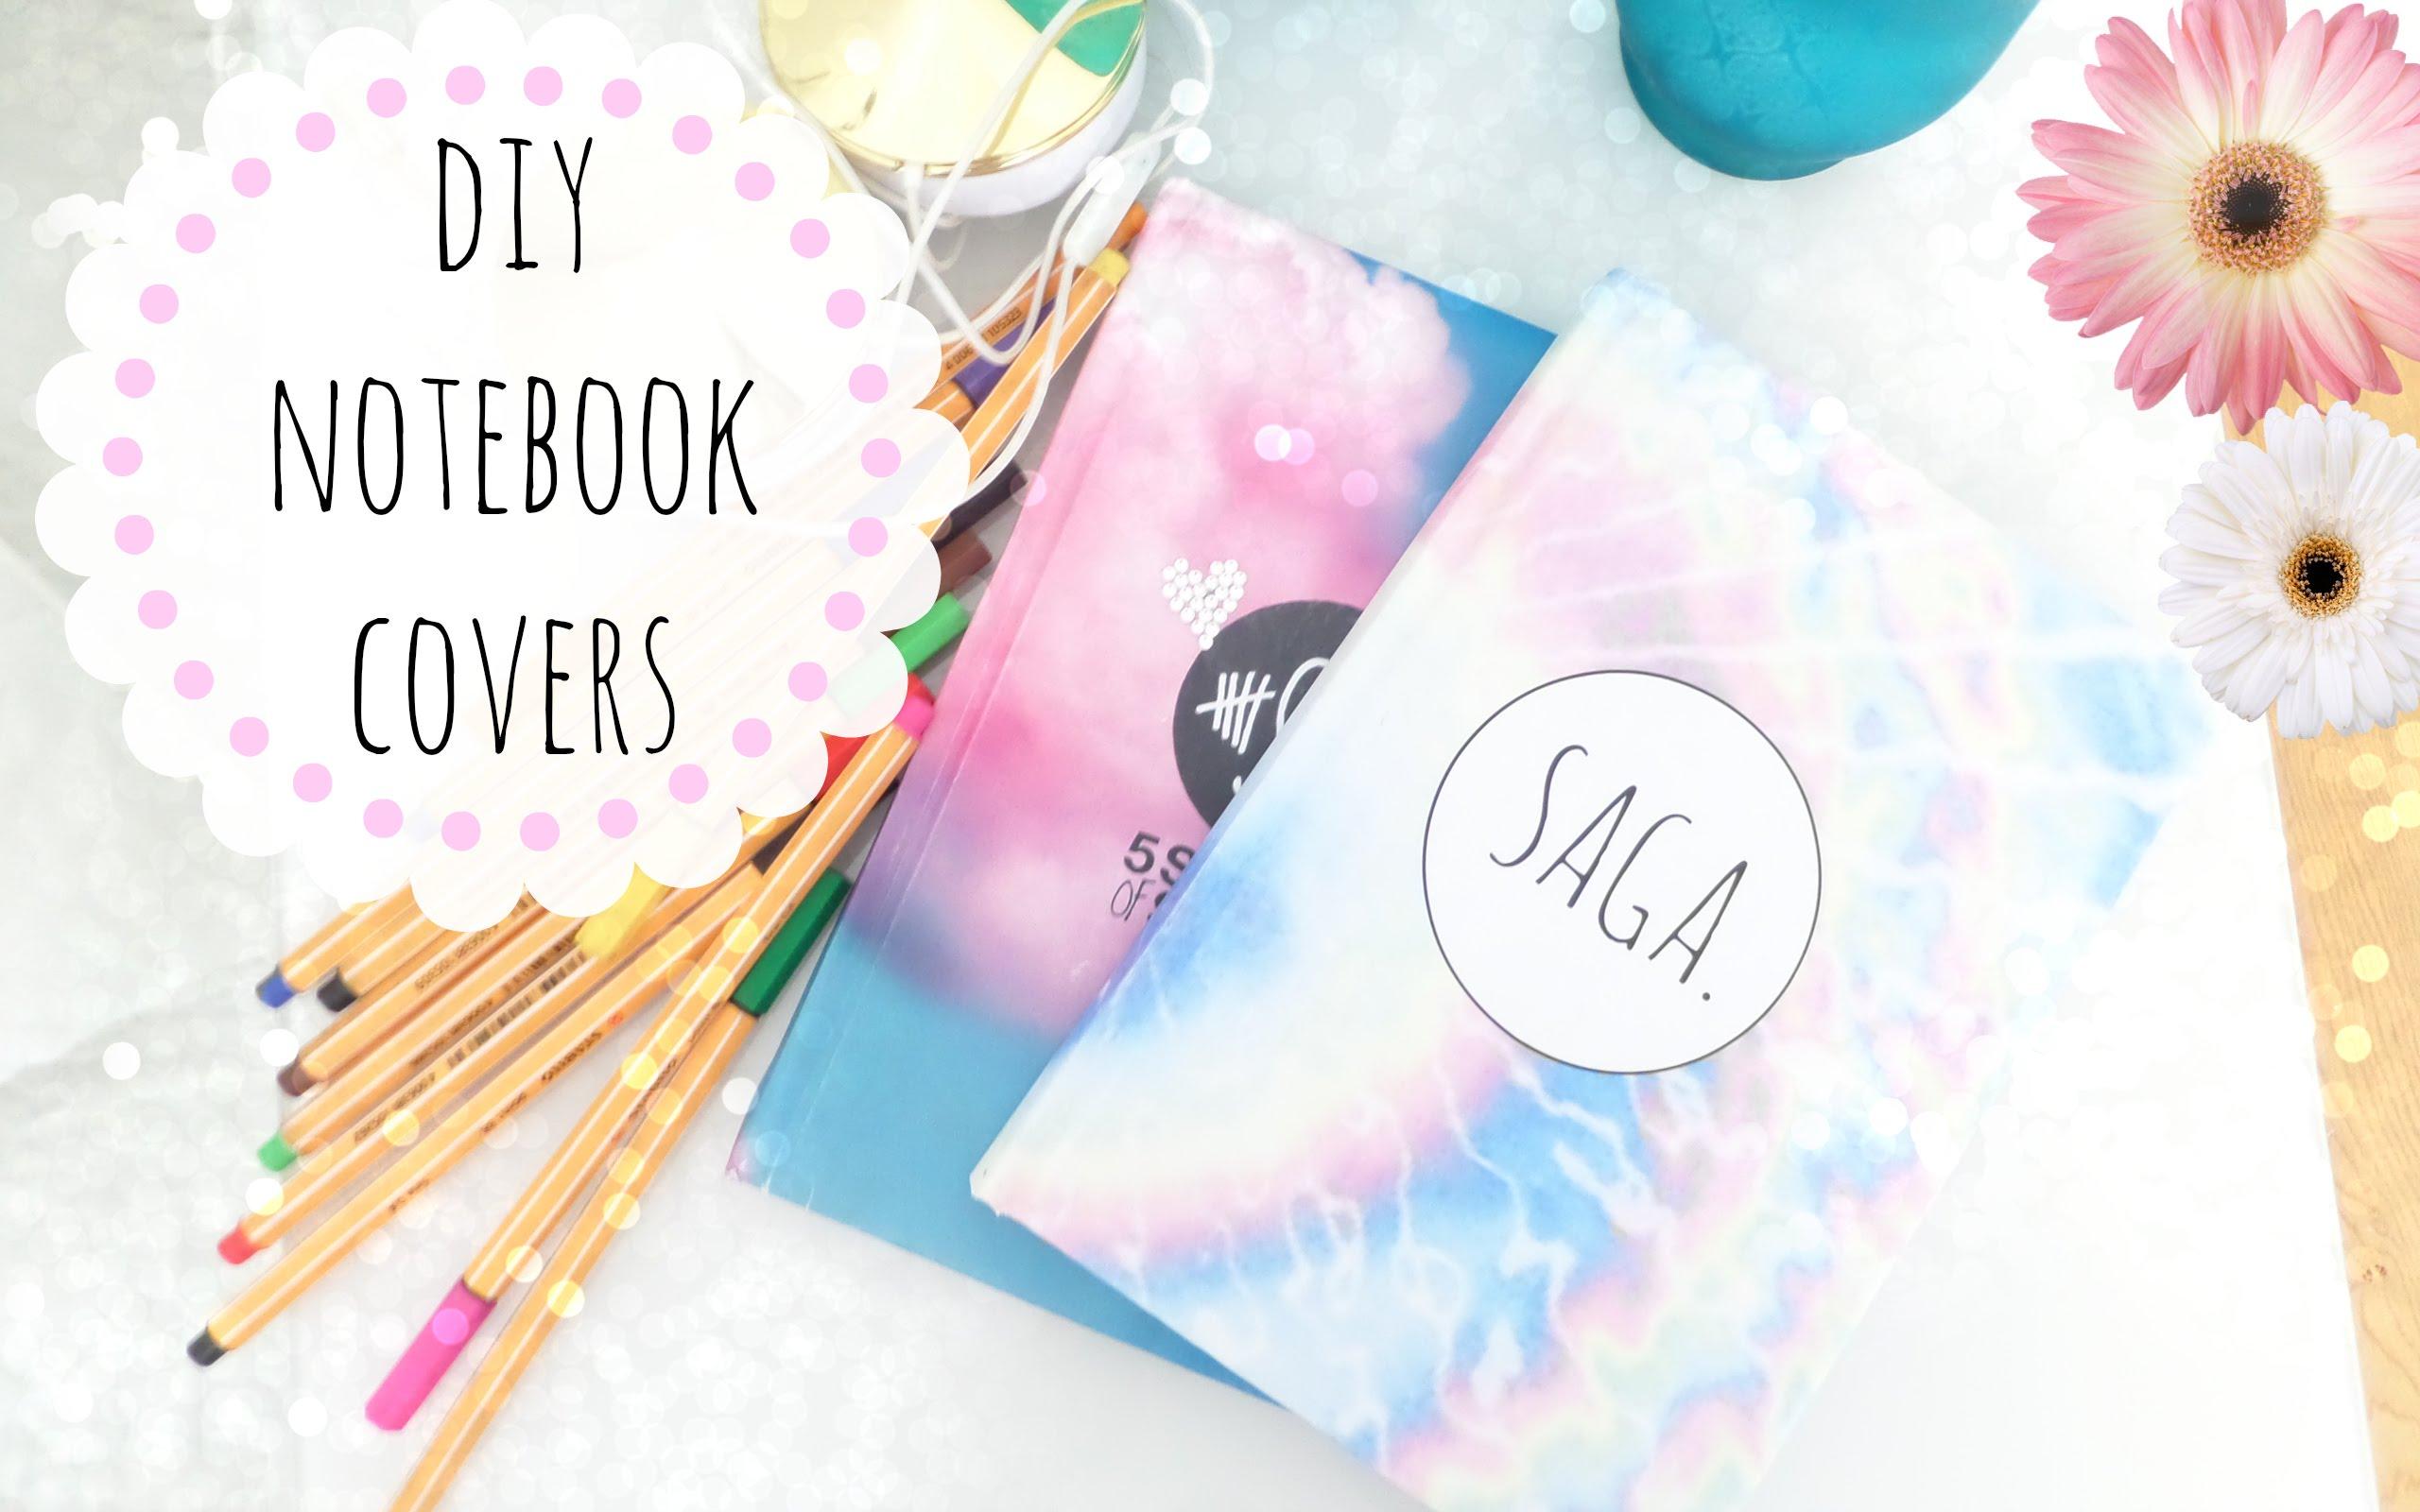 15 Customizable DIY Notebook Covers (Part 2)